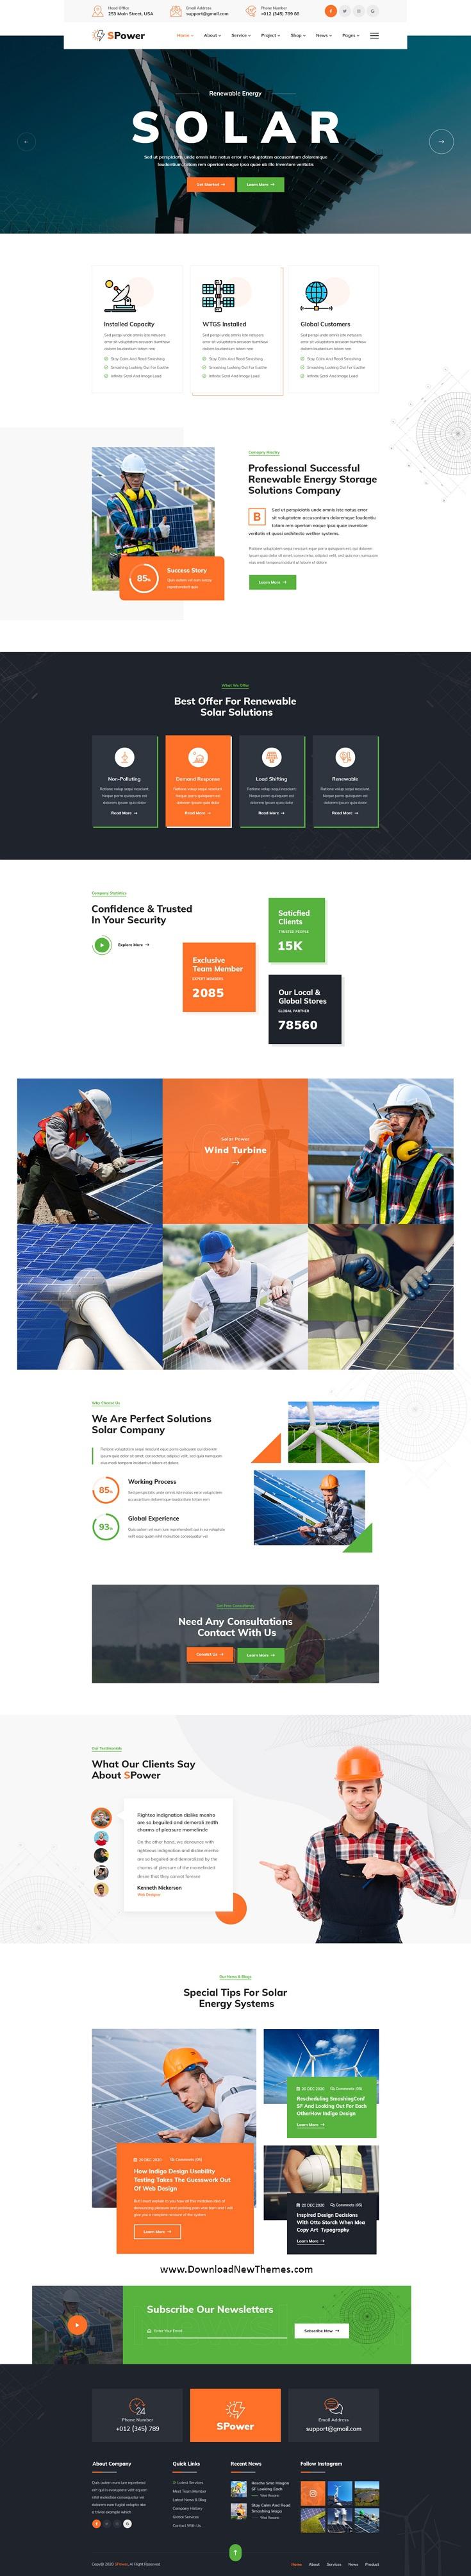 Best Wind & Solar Energy Template